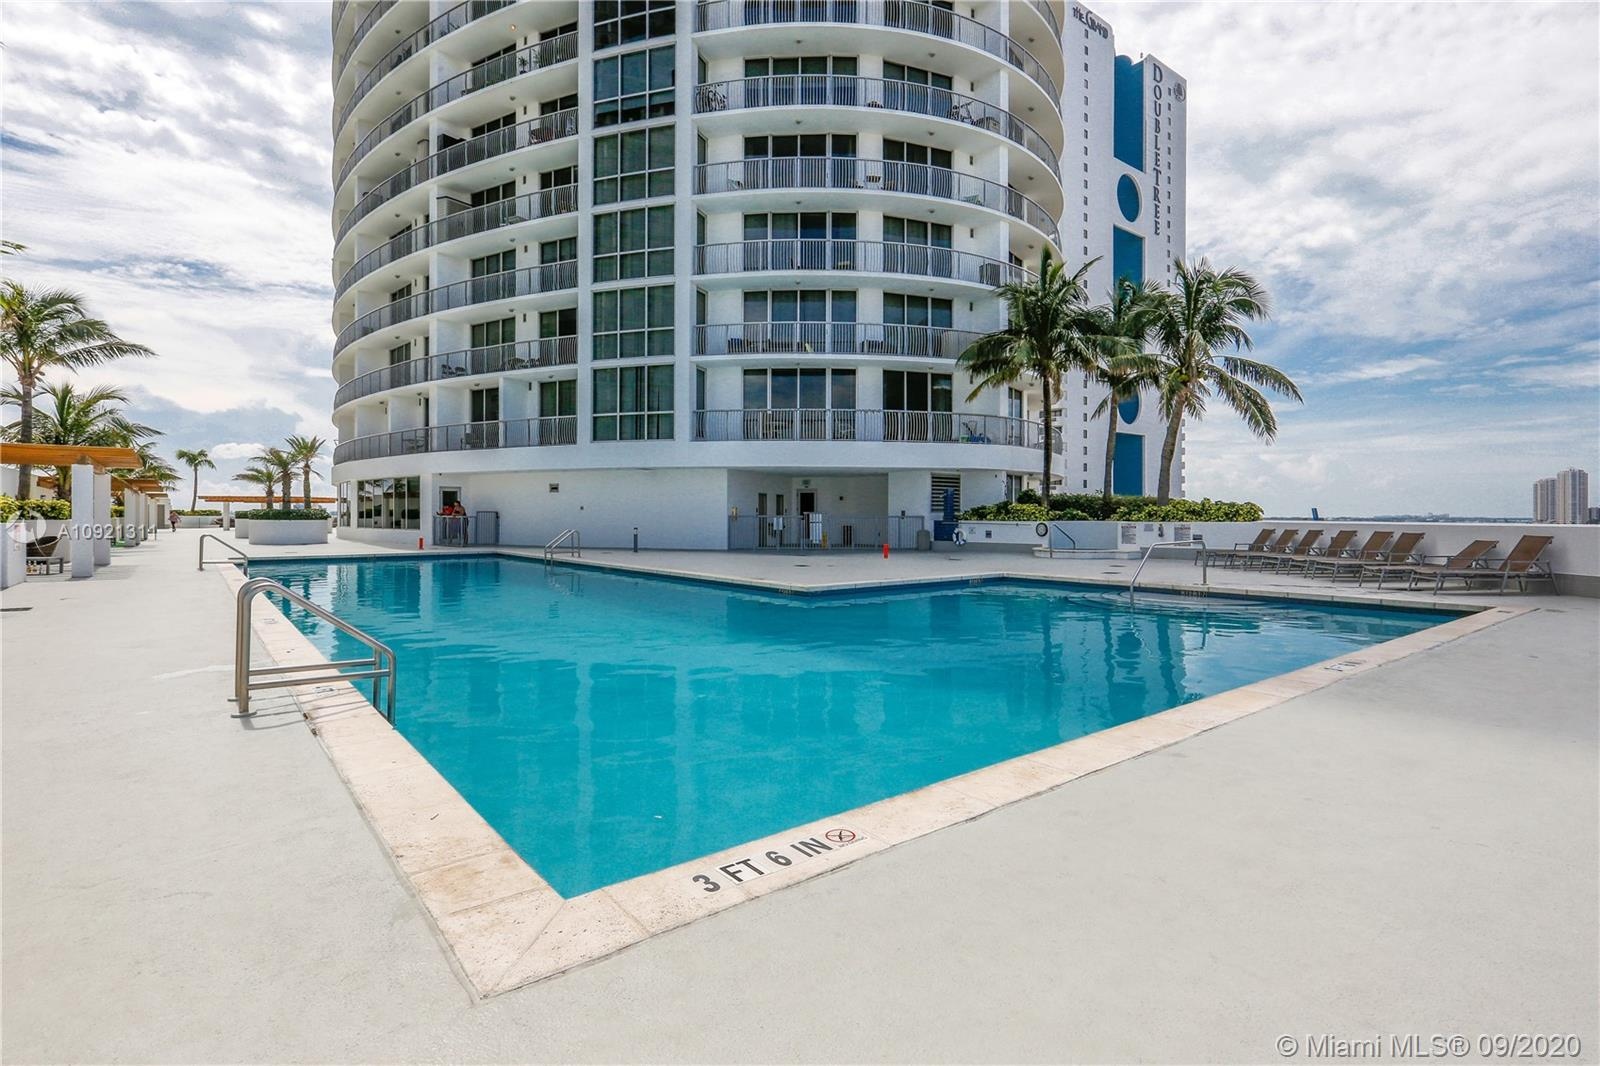 Opera Tower #5611 - 1750 N Bayshore Dr #5611, Miami, FL 33132